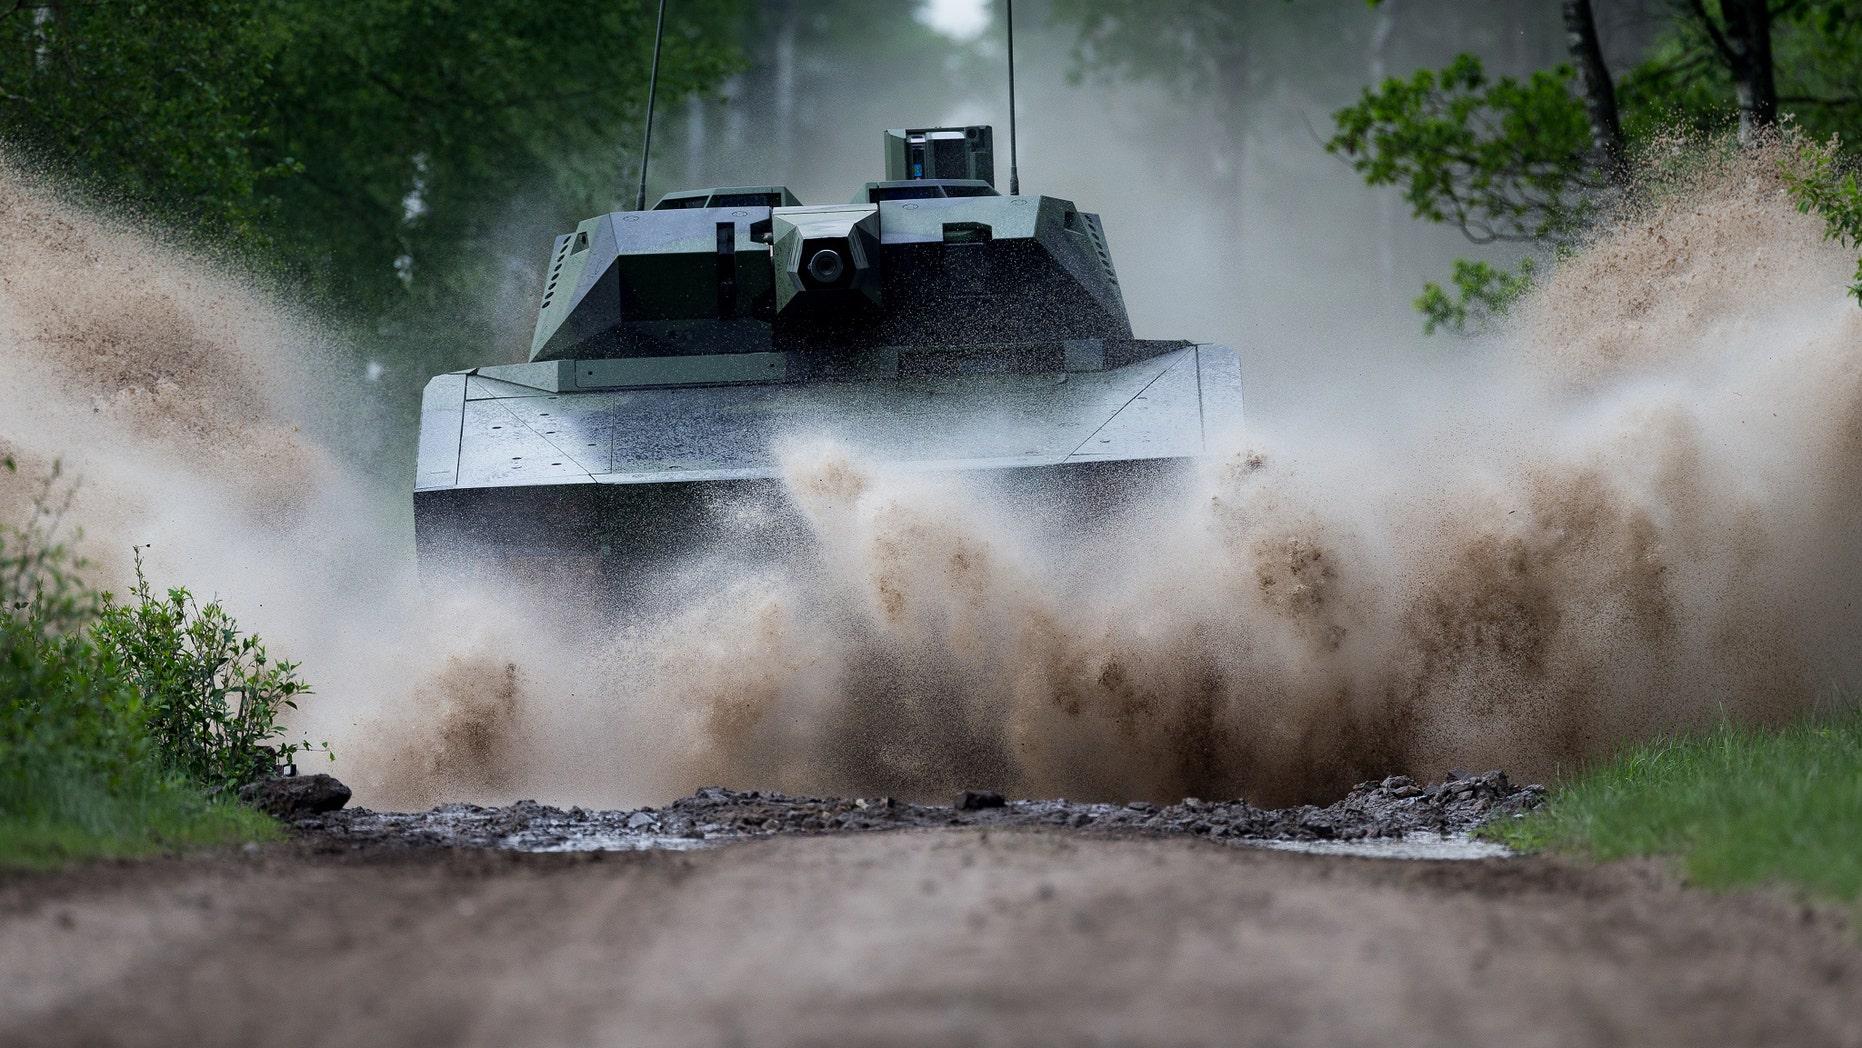 Westlake Legal Group LynxRheinmetall Army AI Task Force builds new prototypes for armored vehicles Warrior Maven Kris Osborn fox-news/tech/topics/us-army fox-news/tech/topics/armed-forces fnc/tech fnc article 55db7072-6822-52c2-84d8-204e3f3d1485